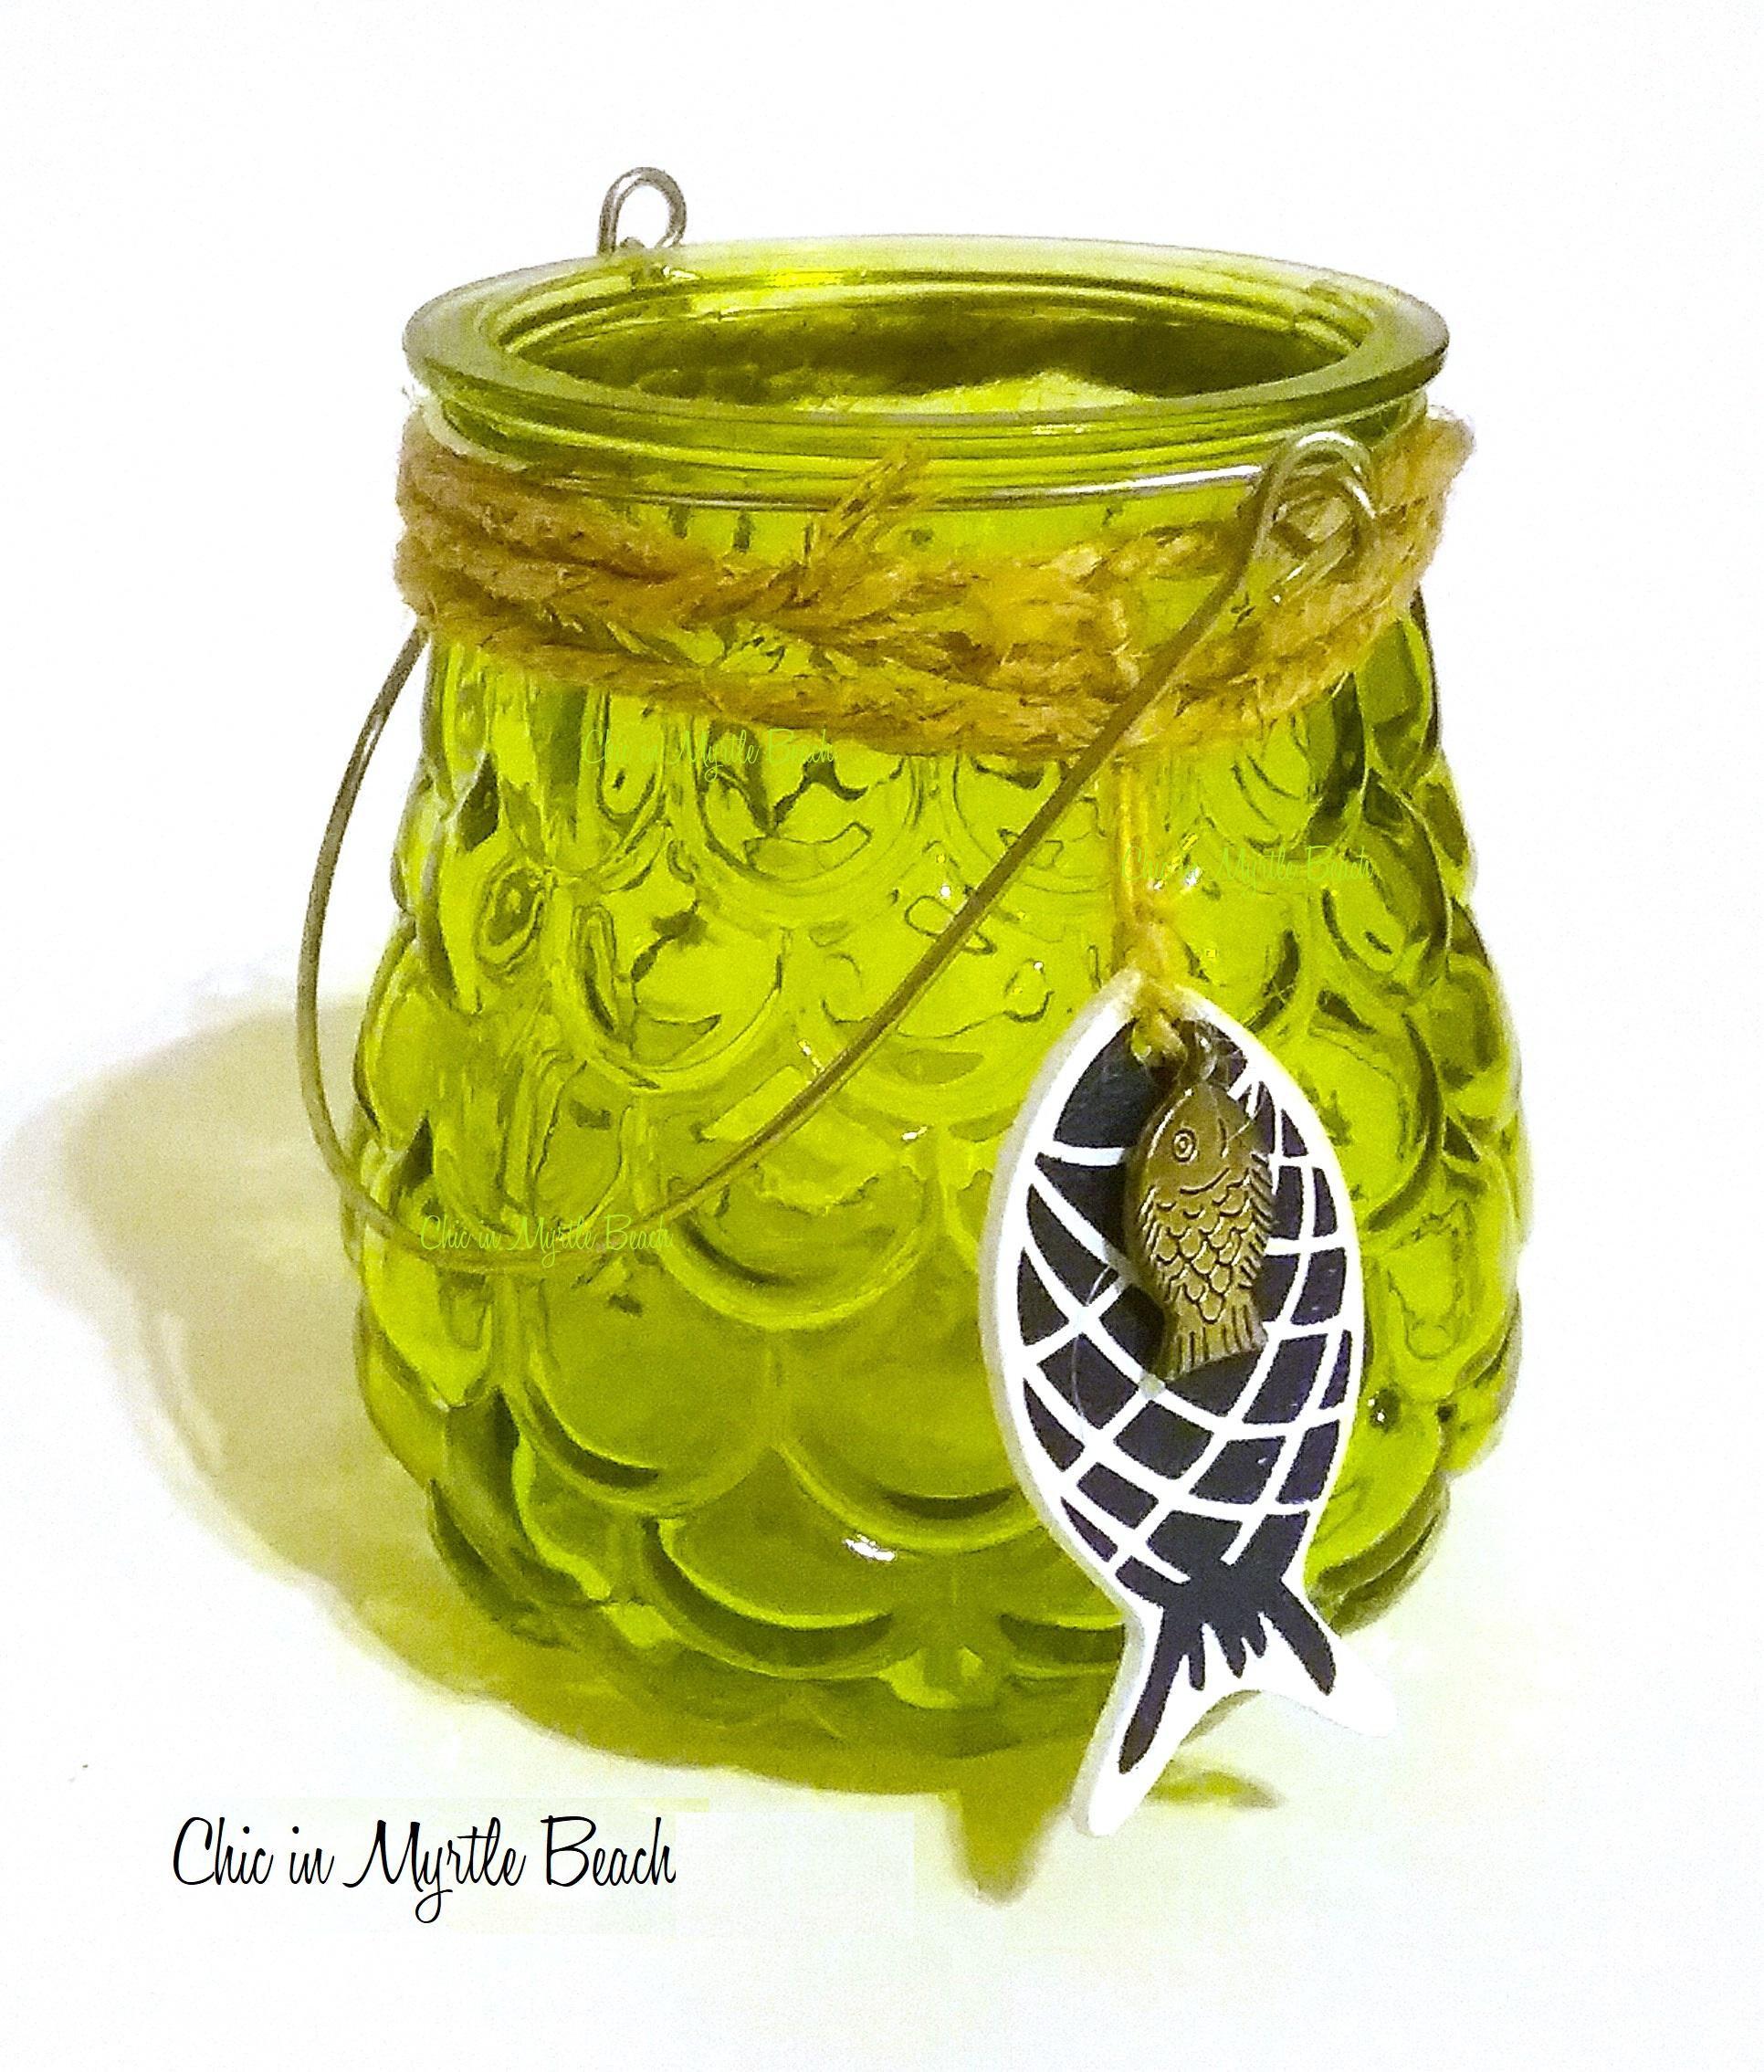 Fun green glass tealight lantern, perfect for your coastal, beach or nautical home decor! #coastaldecor #beachdecor #nauticaldecor #myebayshop #coastalliving #beachlife #coastaltableware #shabbychic #myrtlebeach